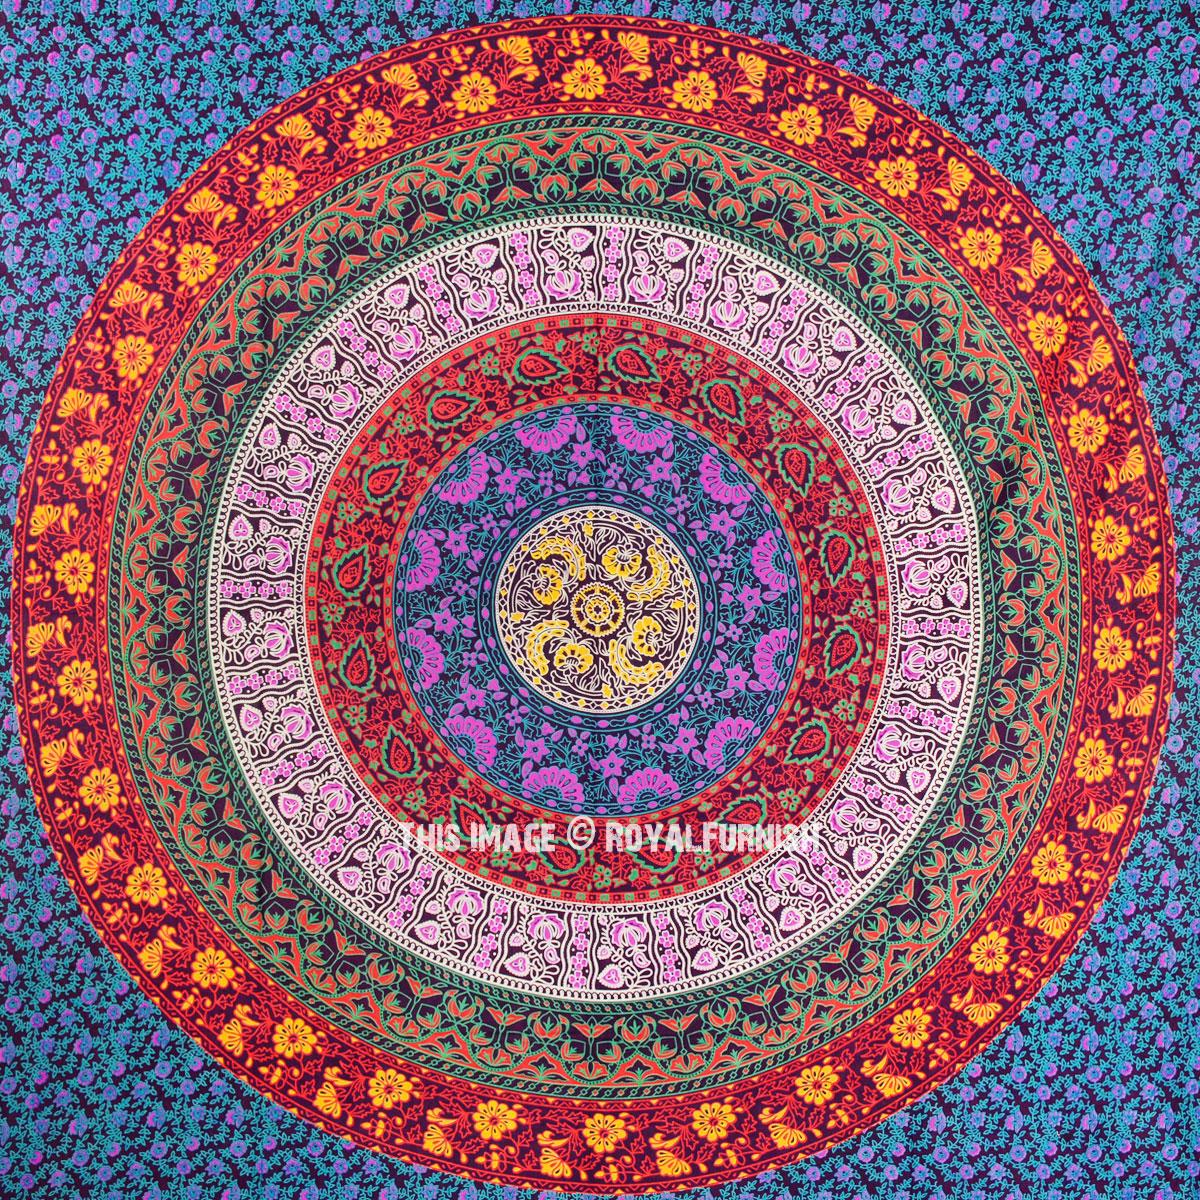 Purple Plum Amp Bow Medallion Mandala Hippie Tapestry